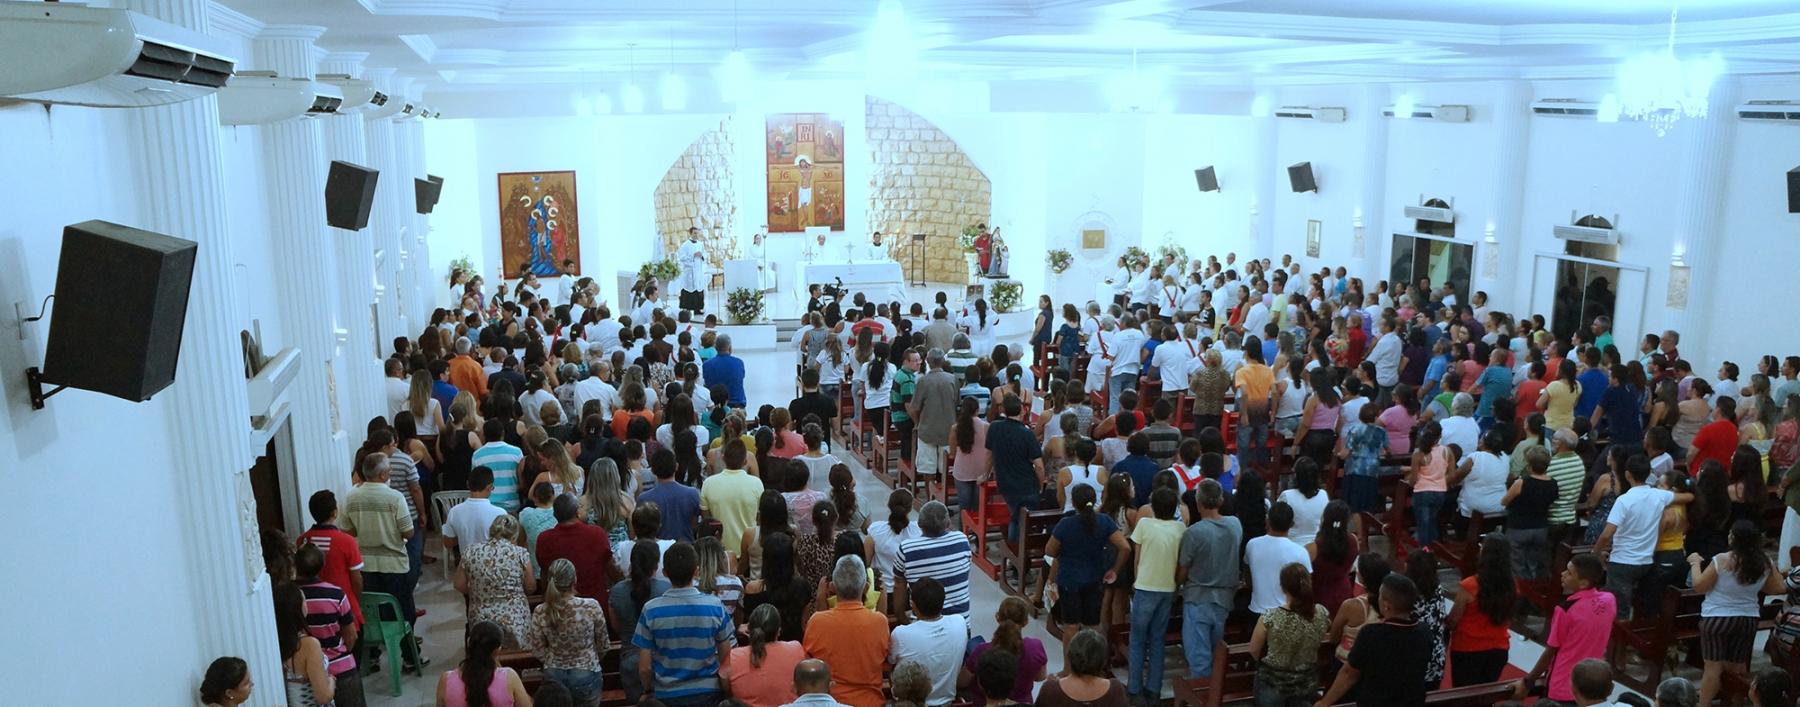 Igreja matriz durante uma celebração